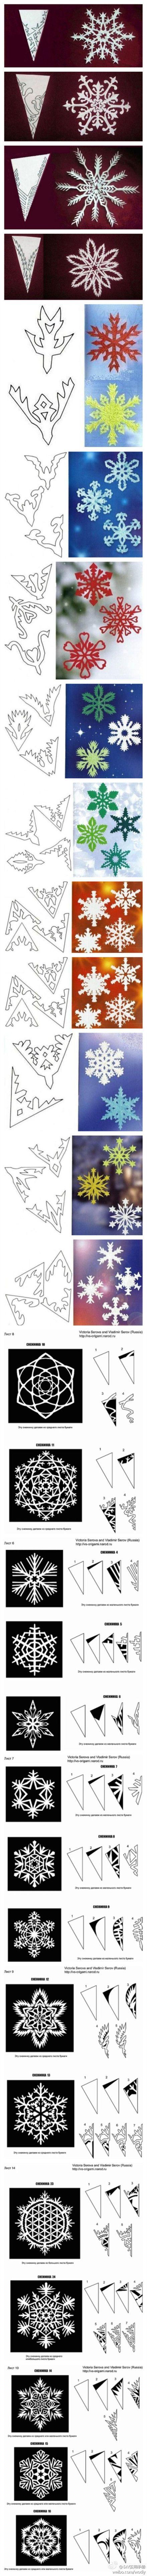 Snowflake paper cutting